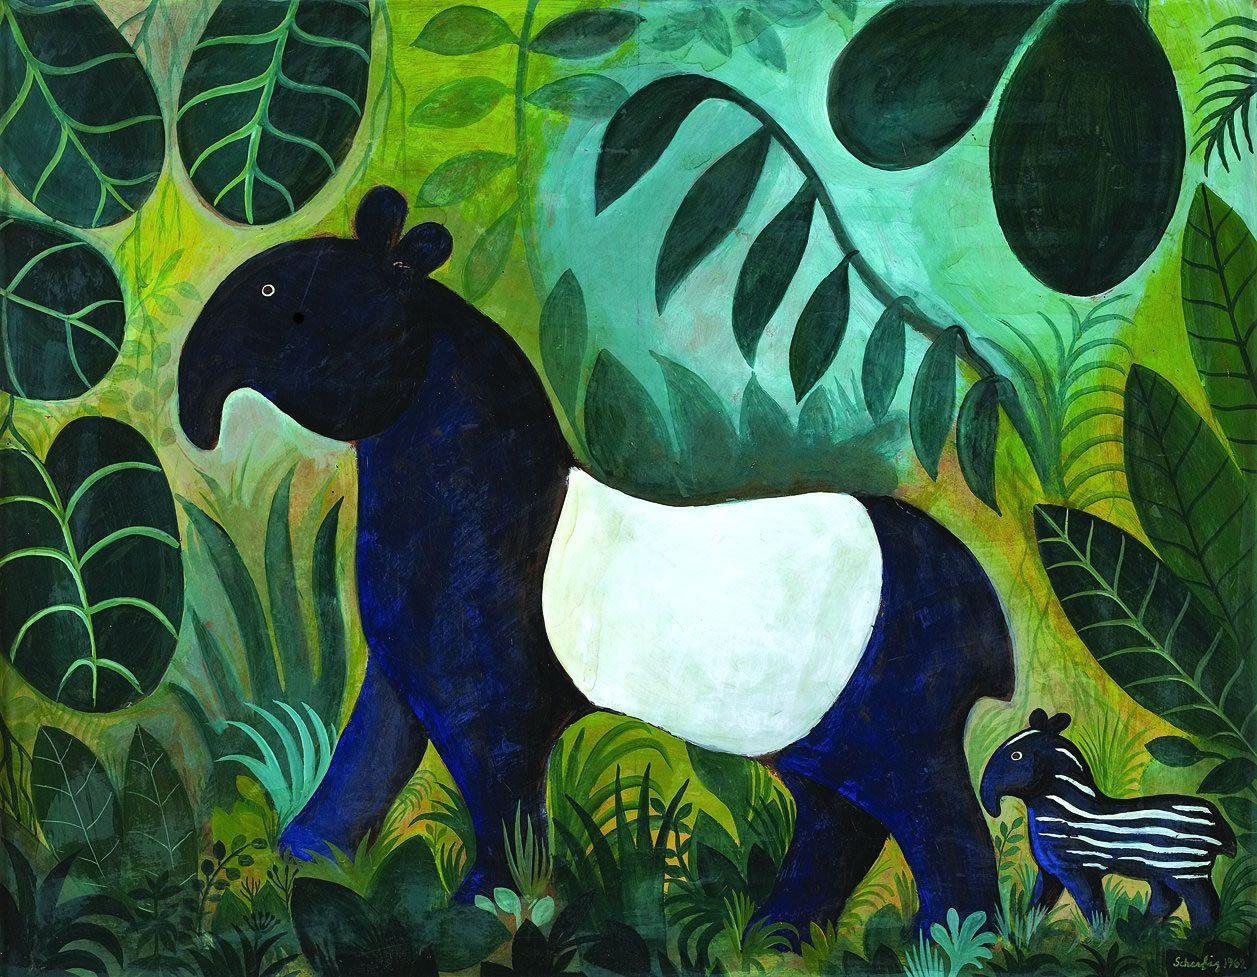 Carnet Imaginaire Glaspopsuper Hans Scherfig Jungle Animal Art Animal Illustration Painting Illustration